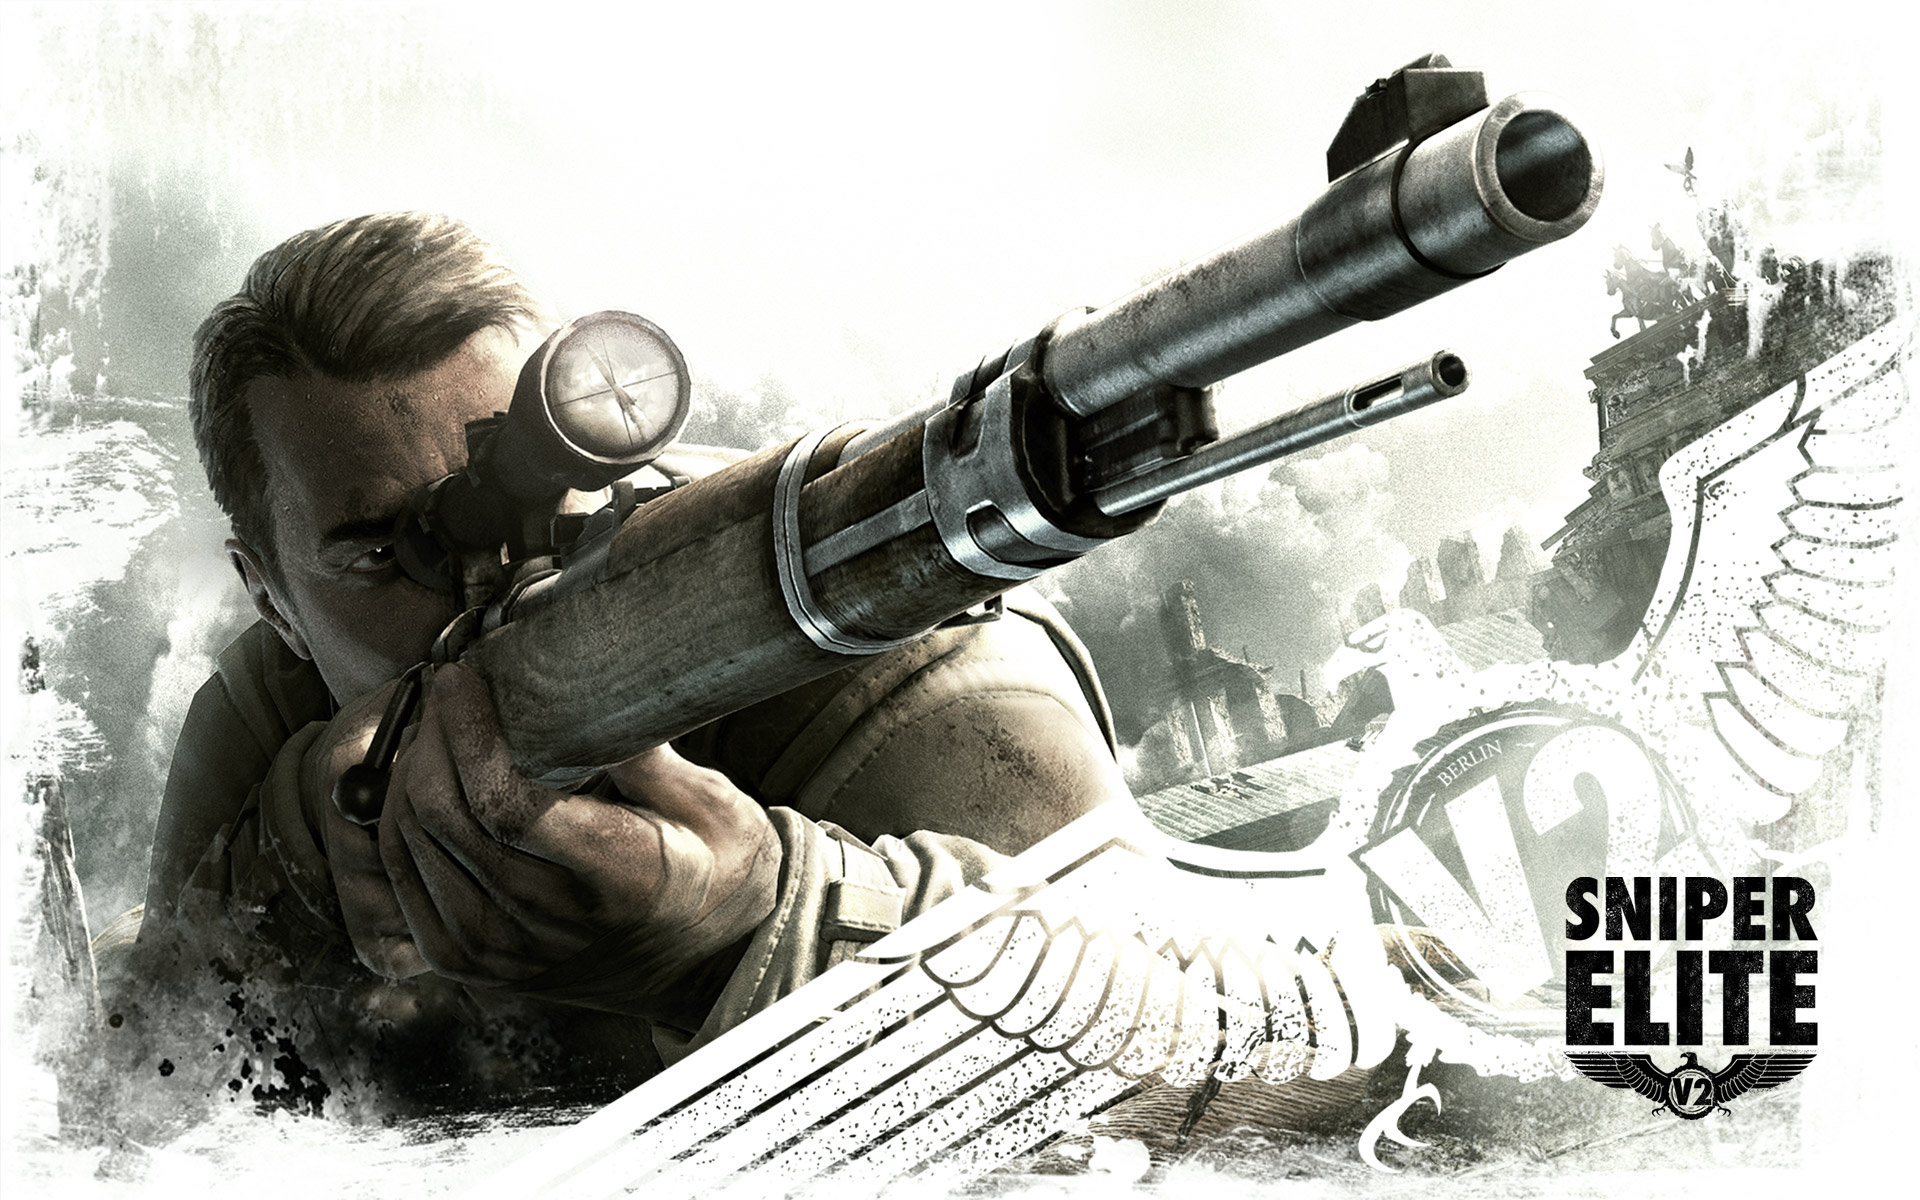 sniper_elite_v2_1920x1200v2